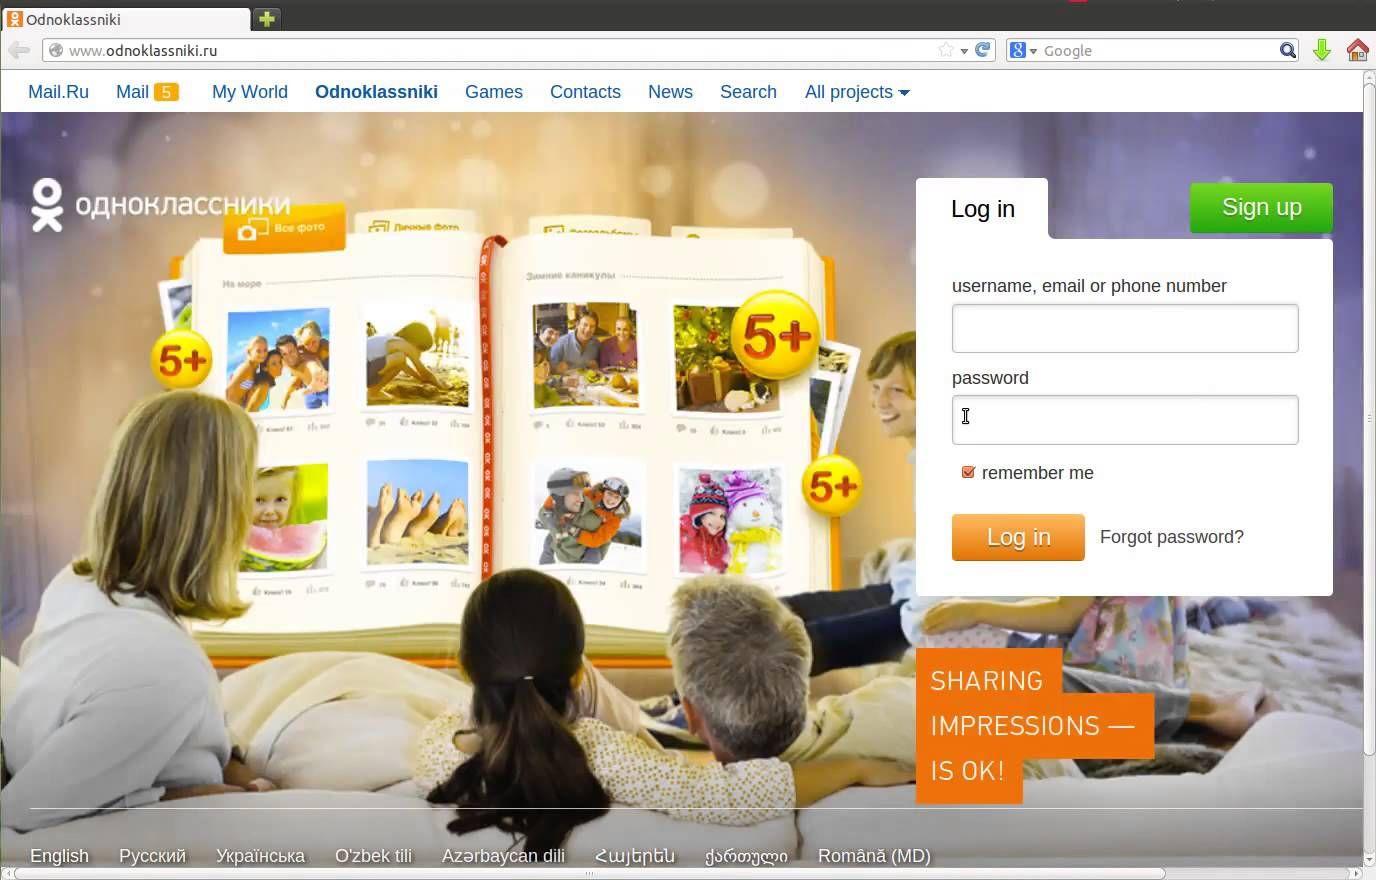 Caress congratulate Sign Odnoklassniki In Ru ideal